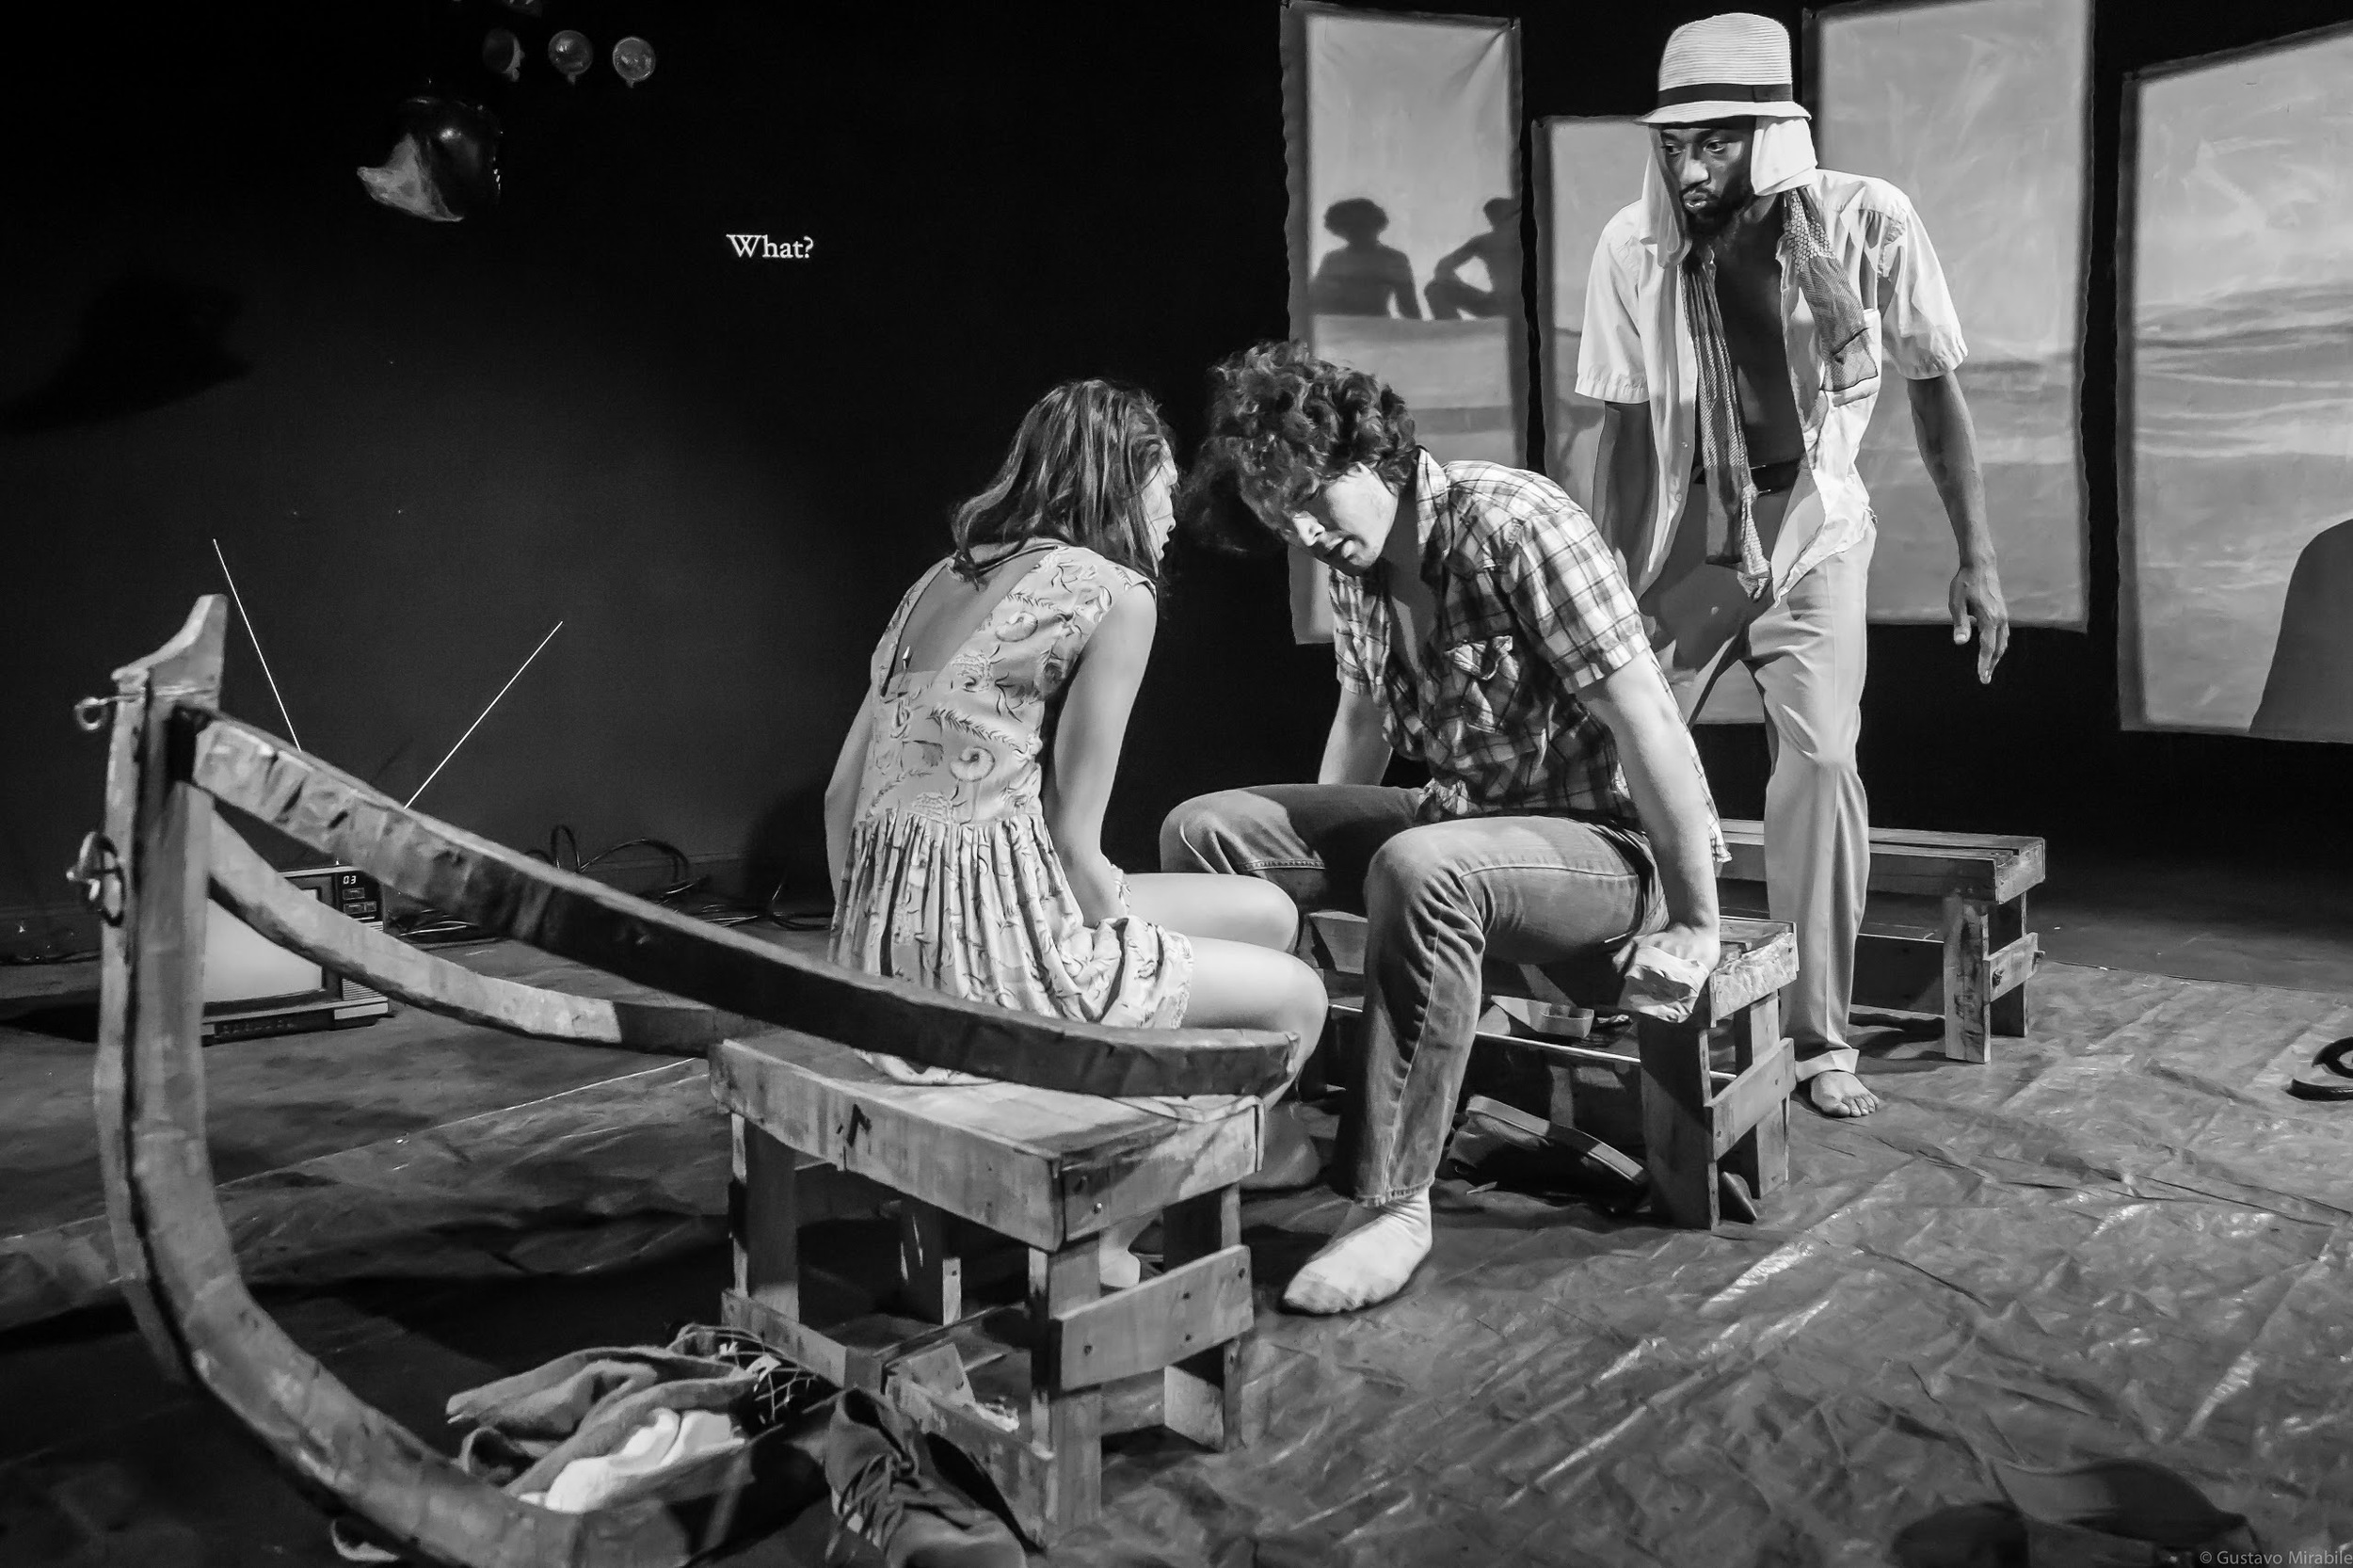 20150320 - Teatrica - Yoleros 0145 (1).jpg